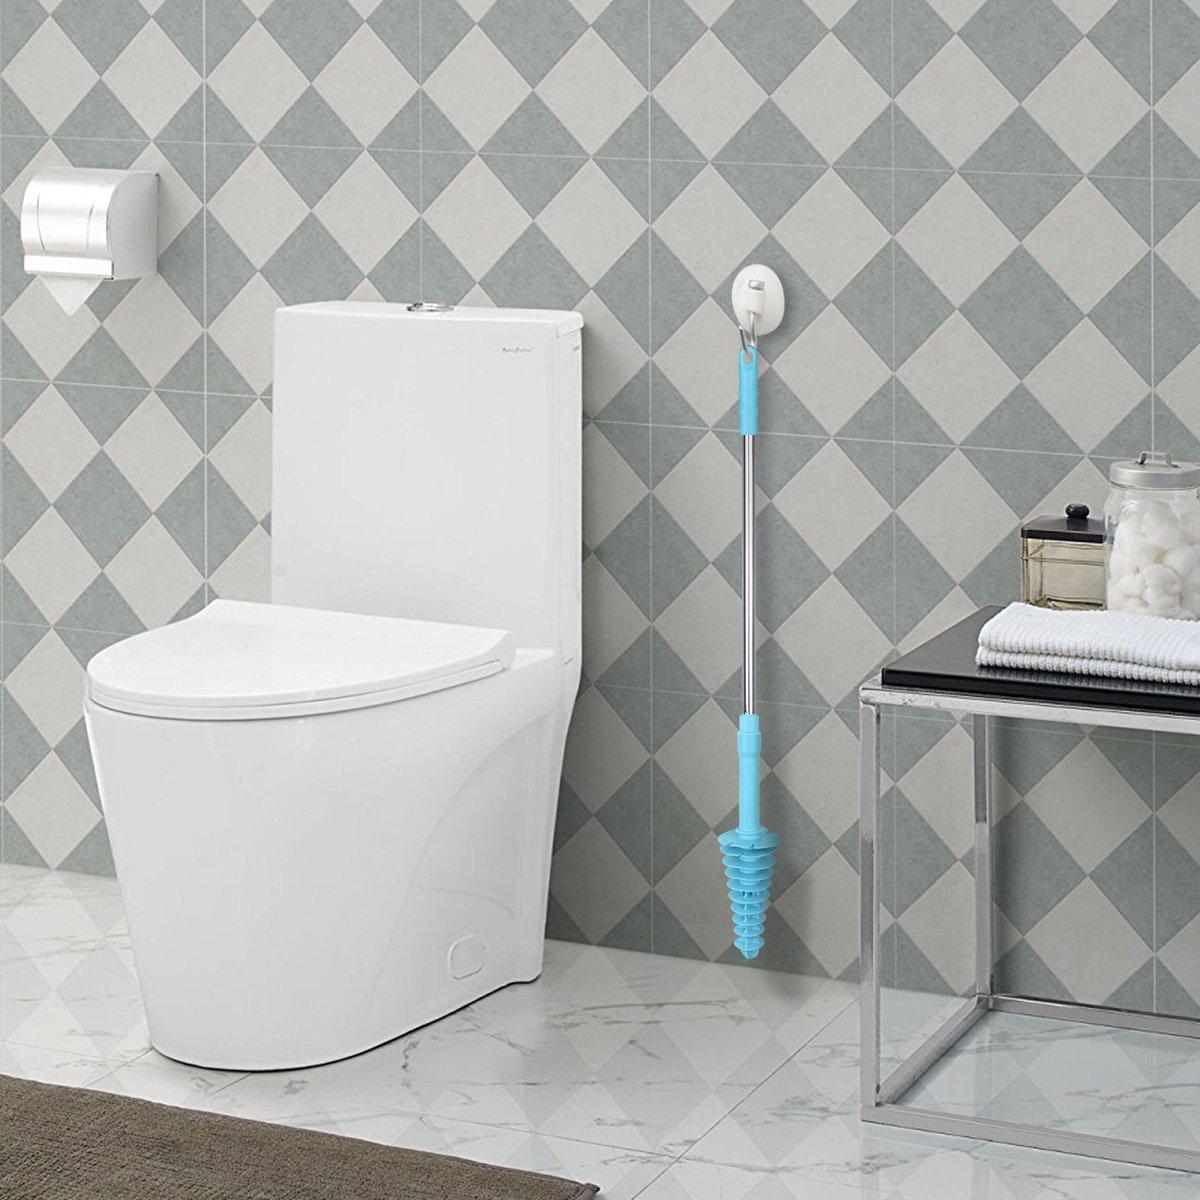 CNSTAR Toilet Plunger, Powerful High Pressure Suitable Sure Drain ...